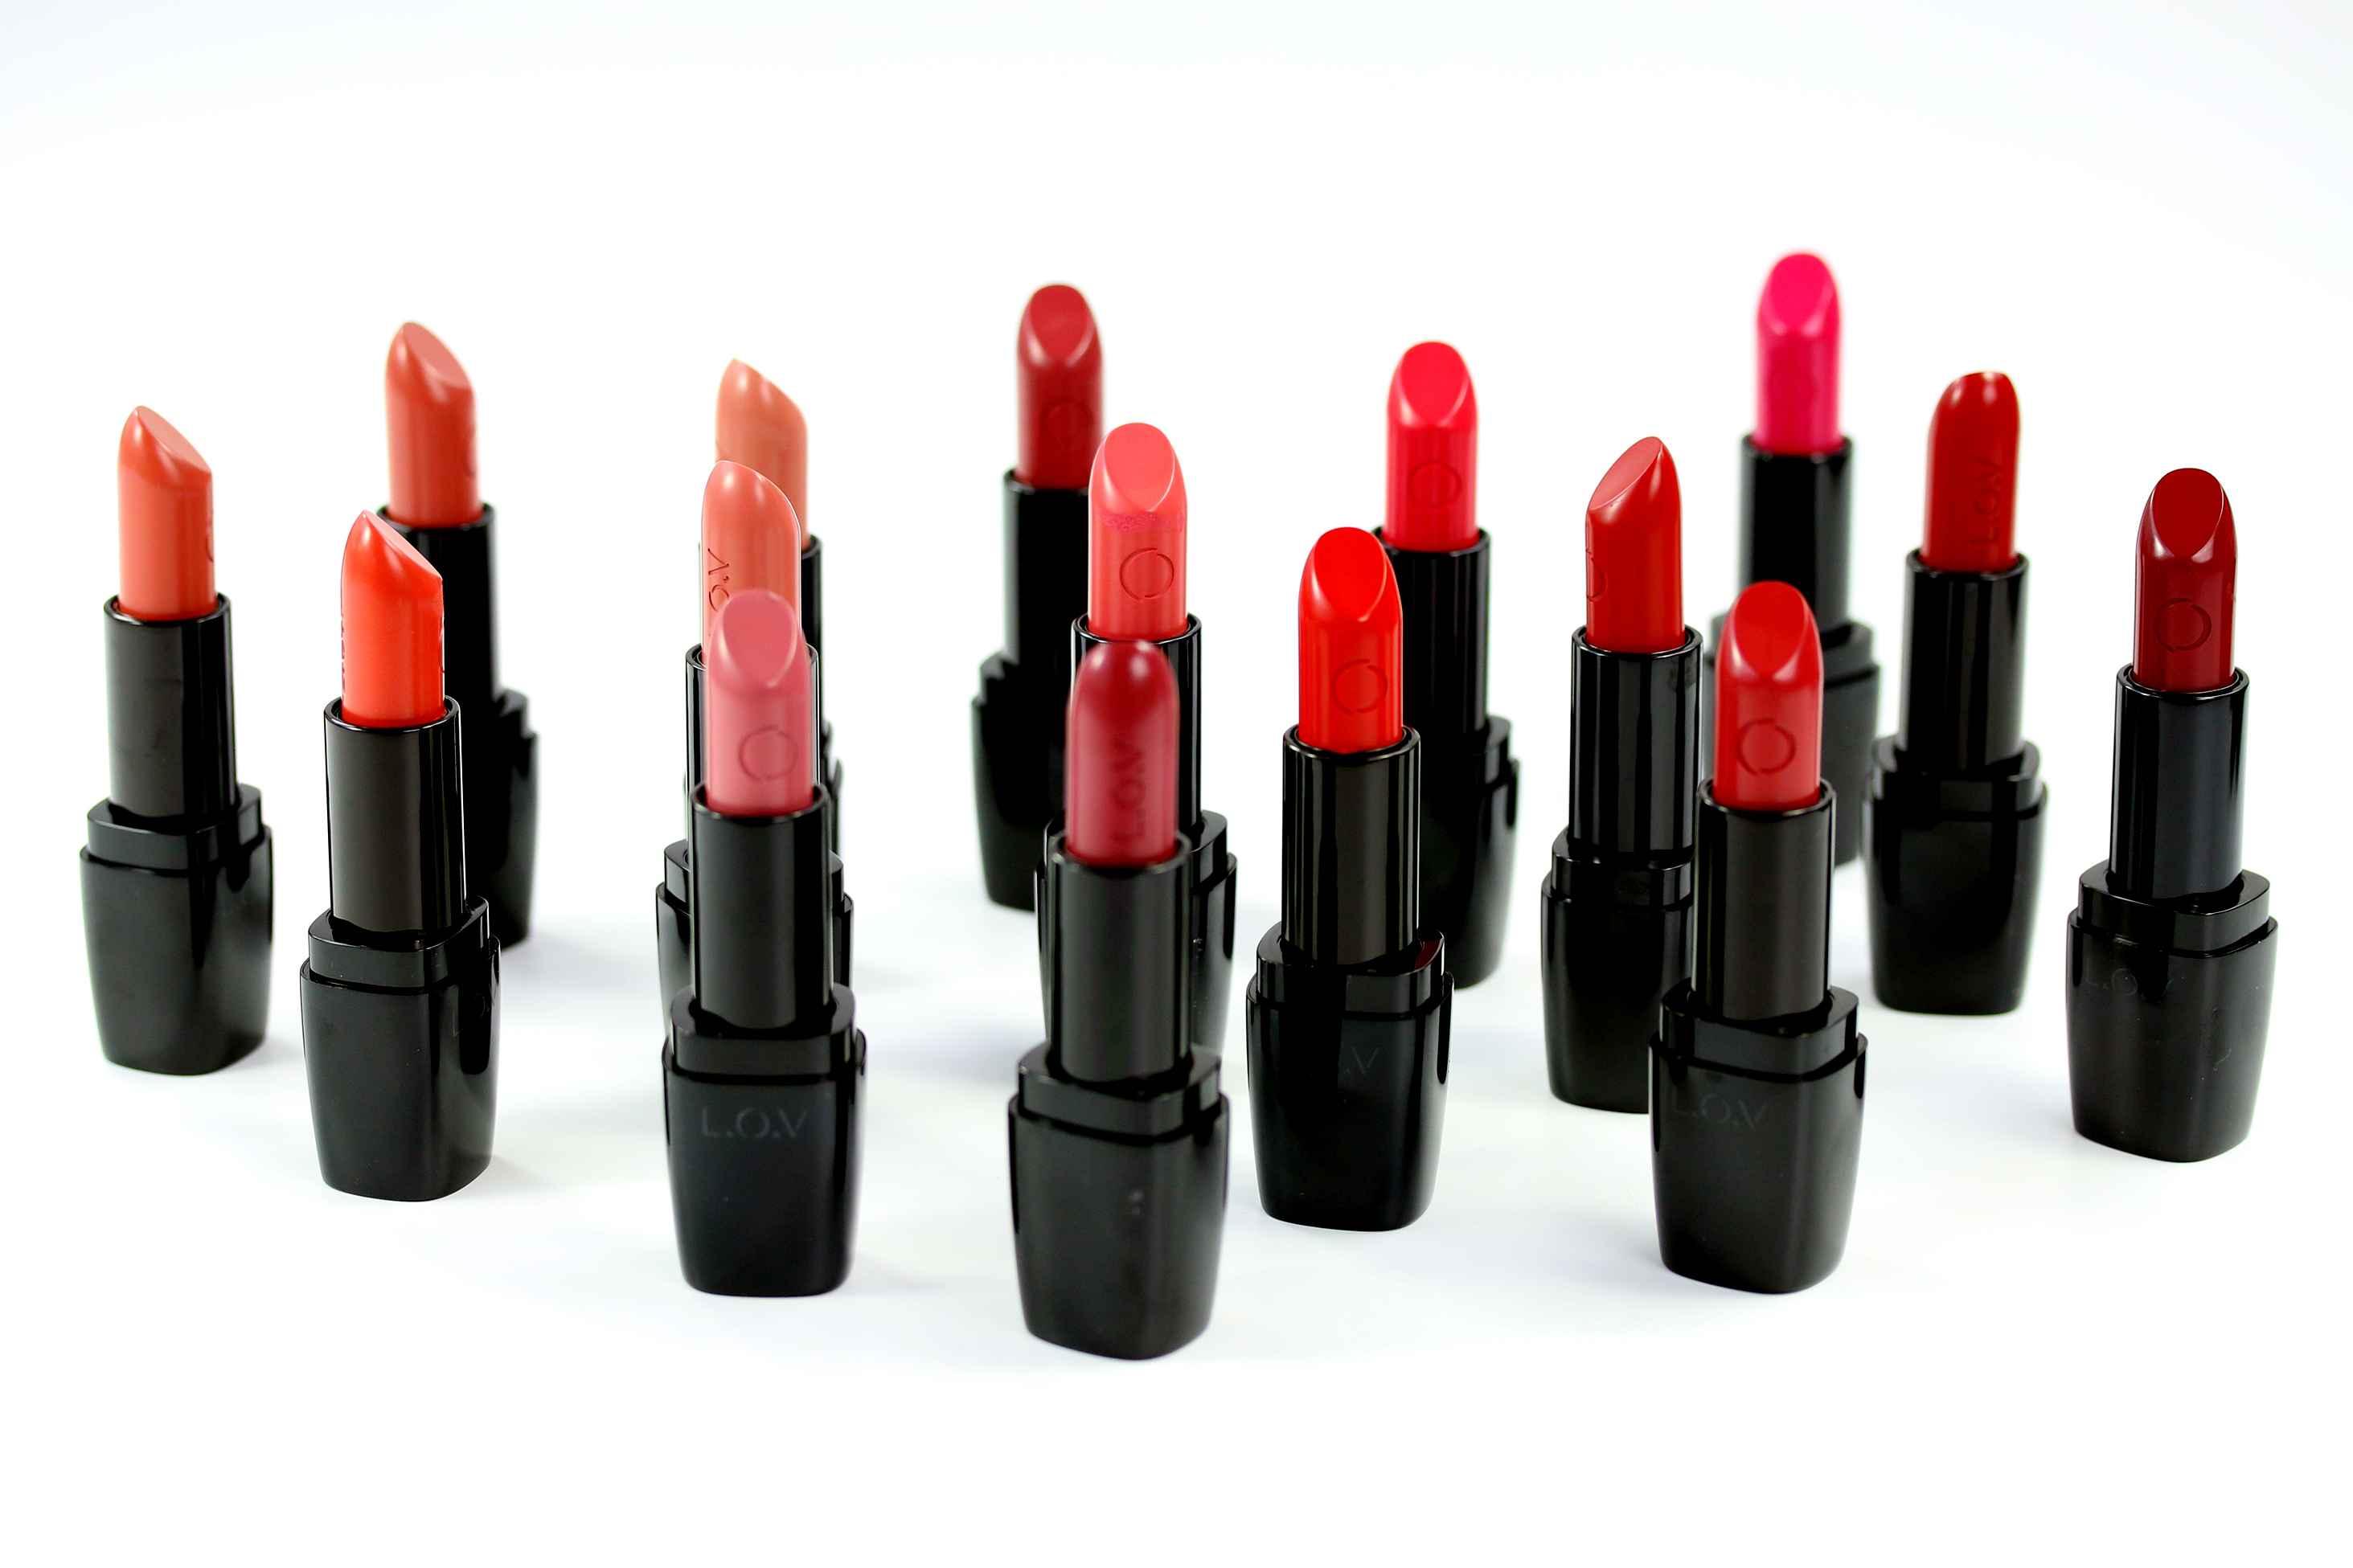 LIPaffair Color & Care Lippenstift Review